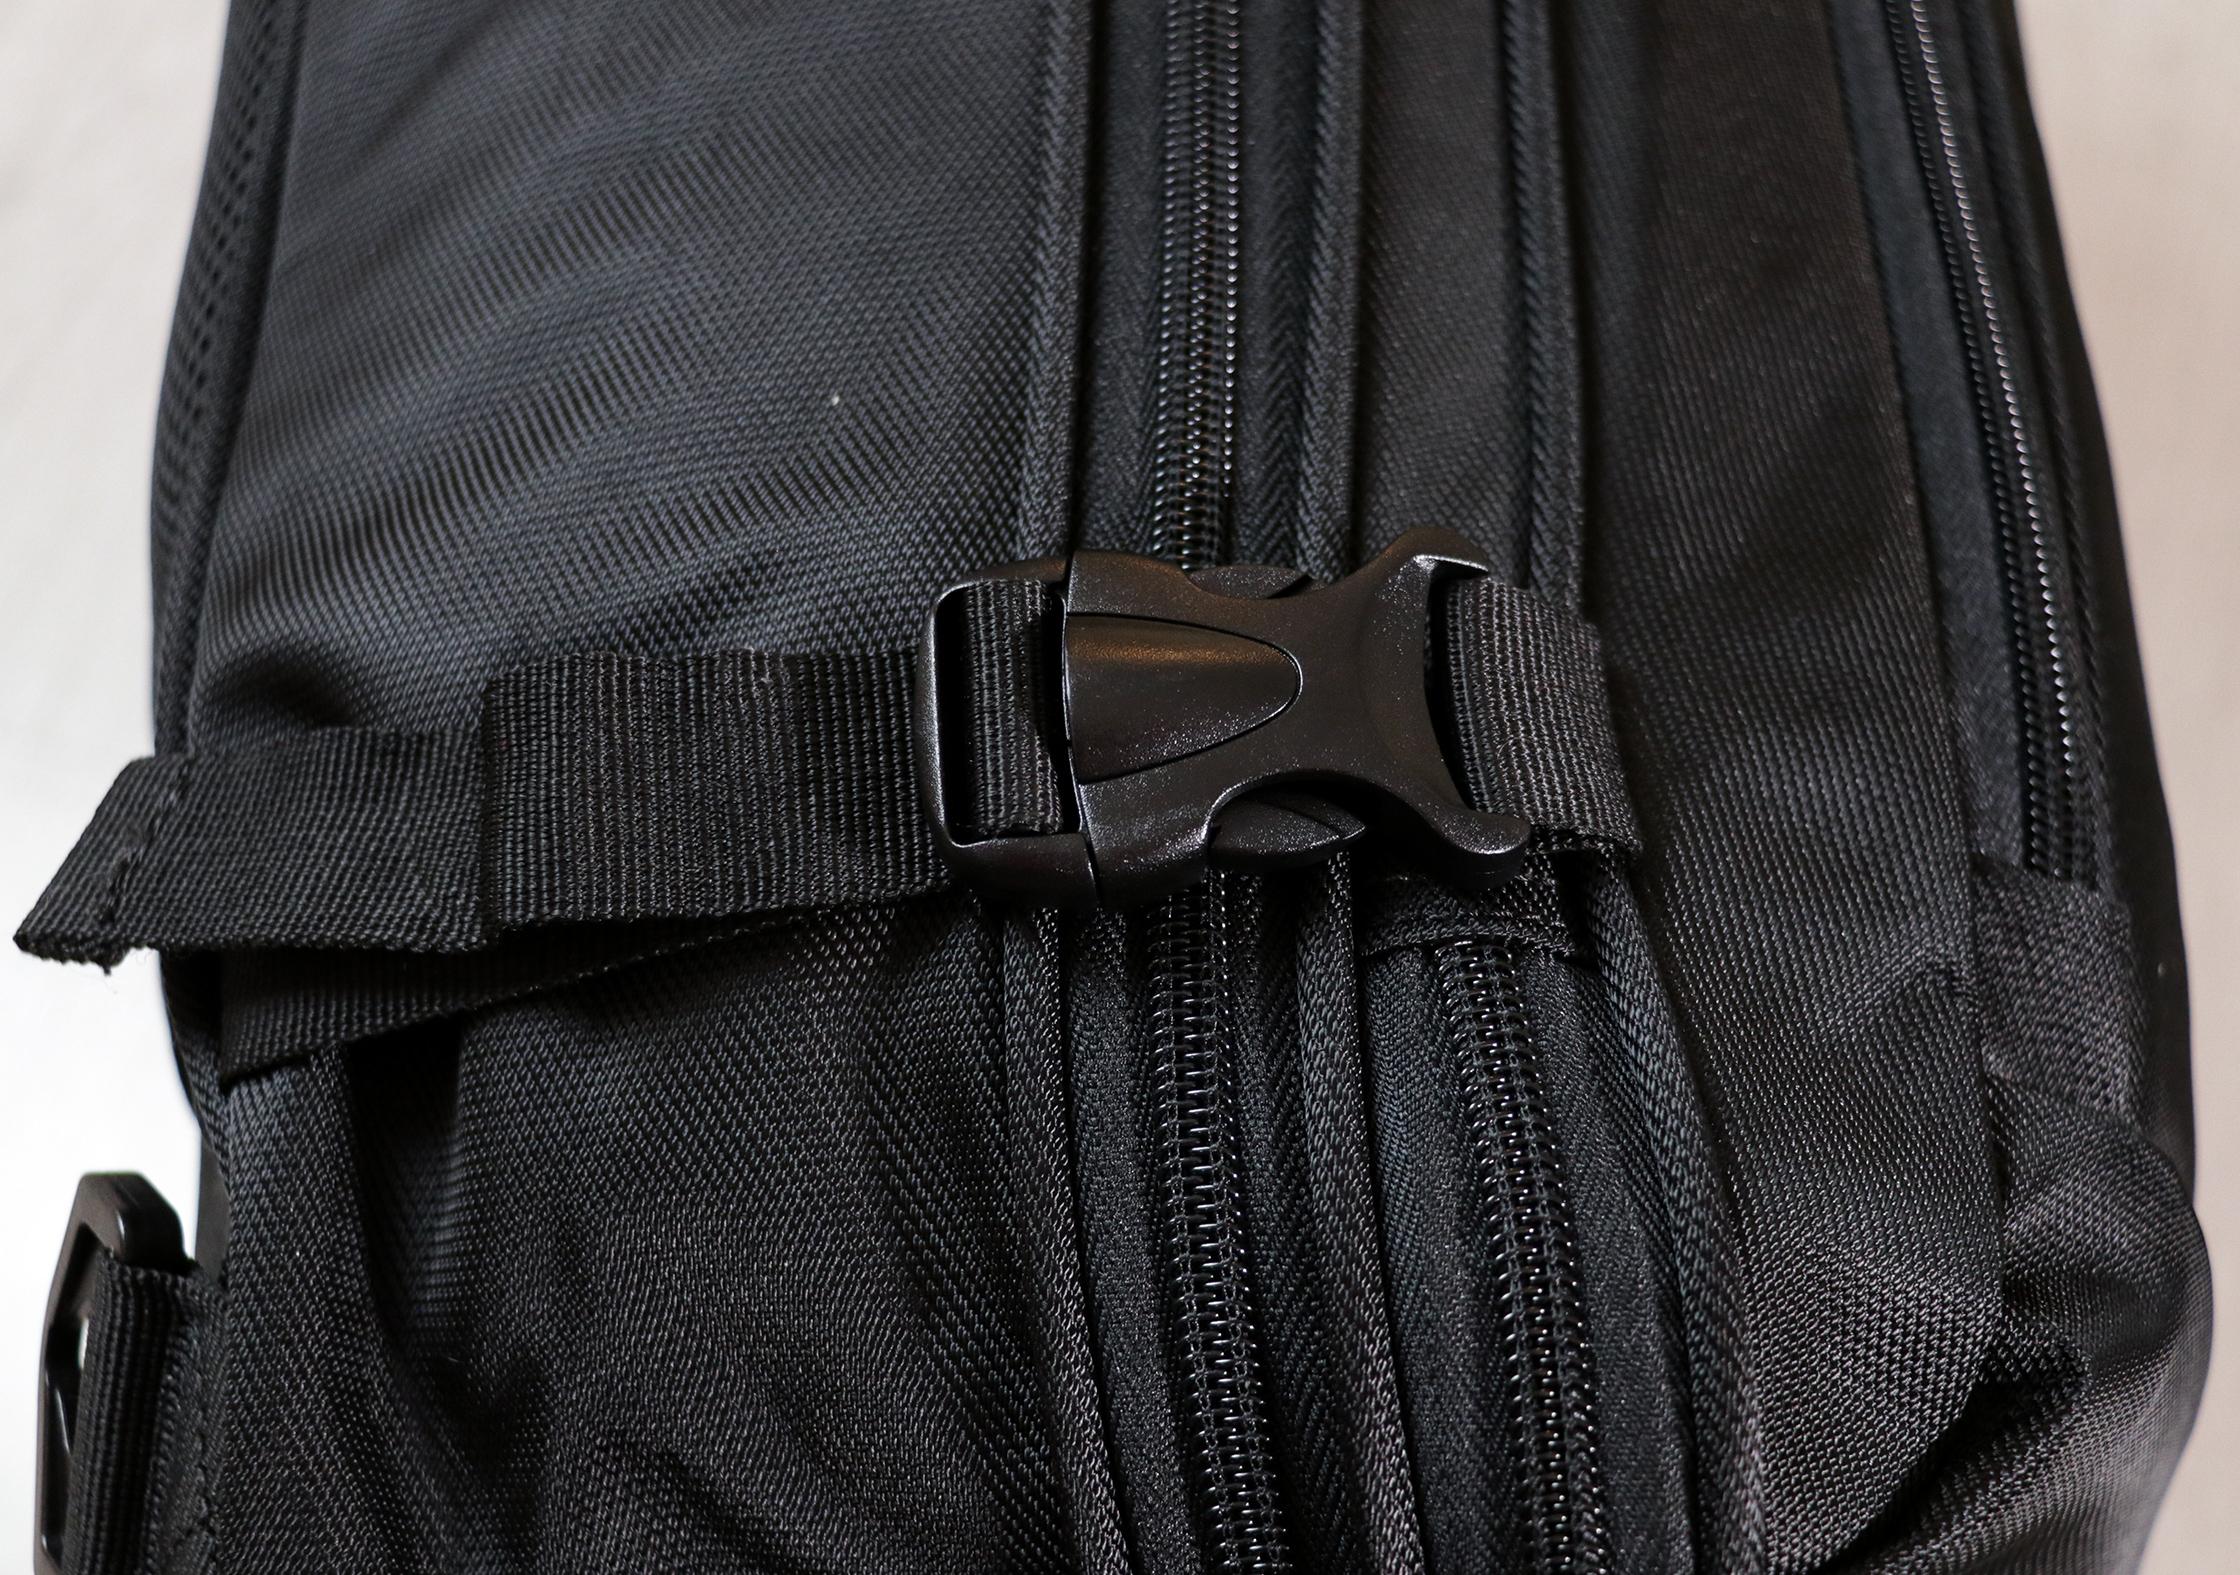 AmazonBasics Carry-On Travel Backpack Buckles